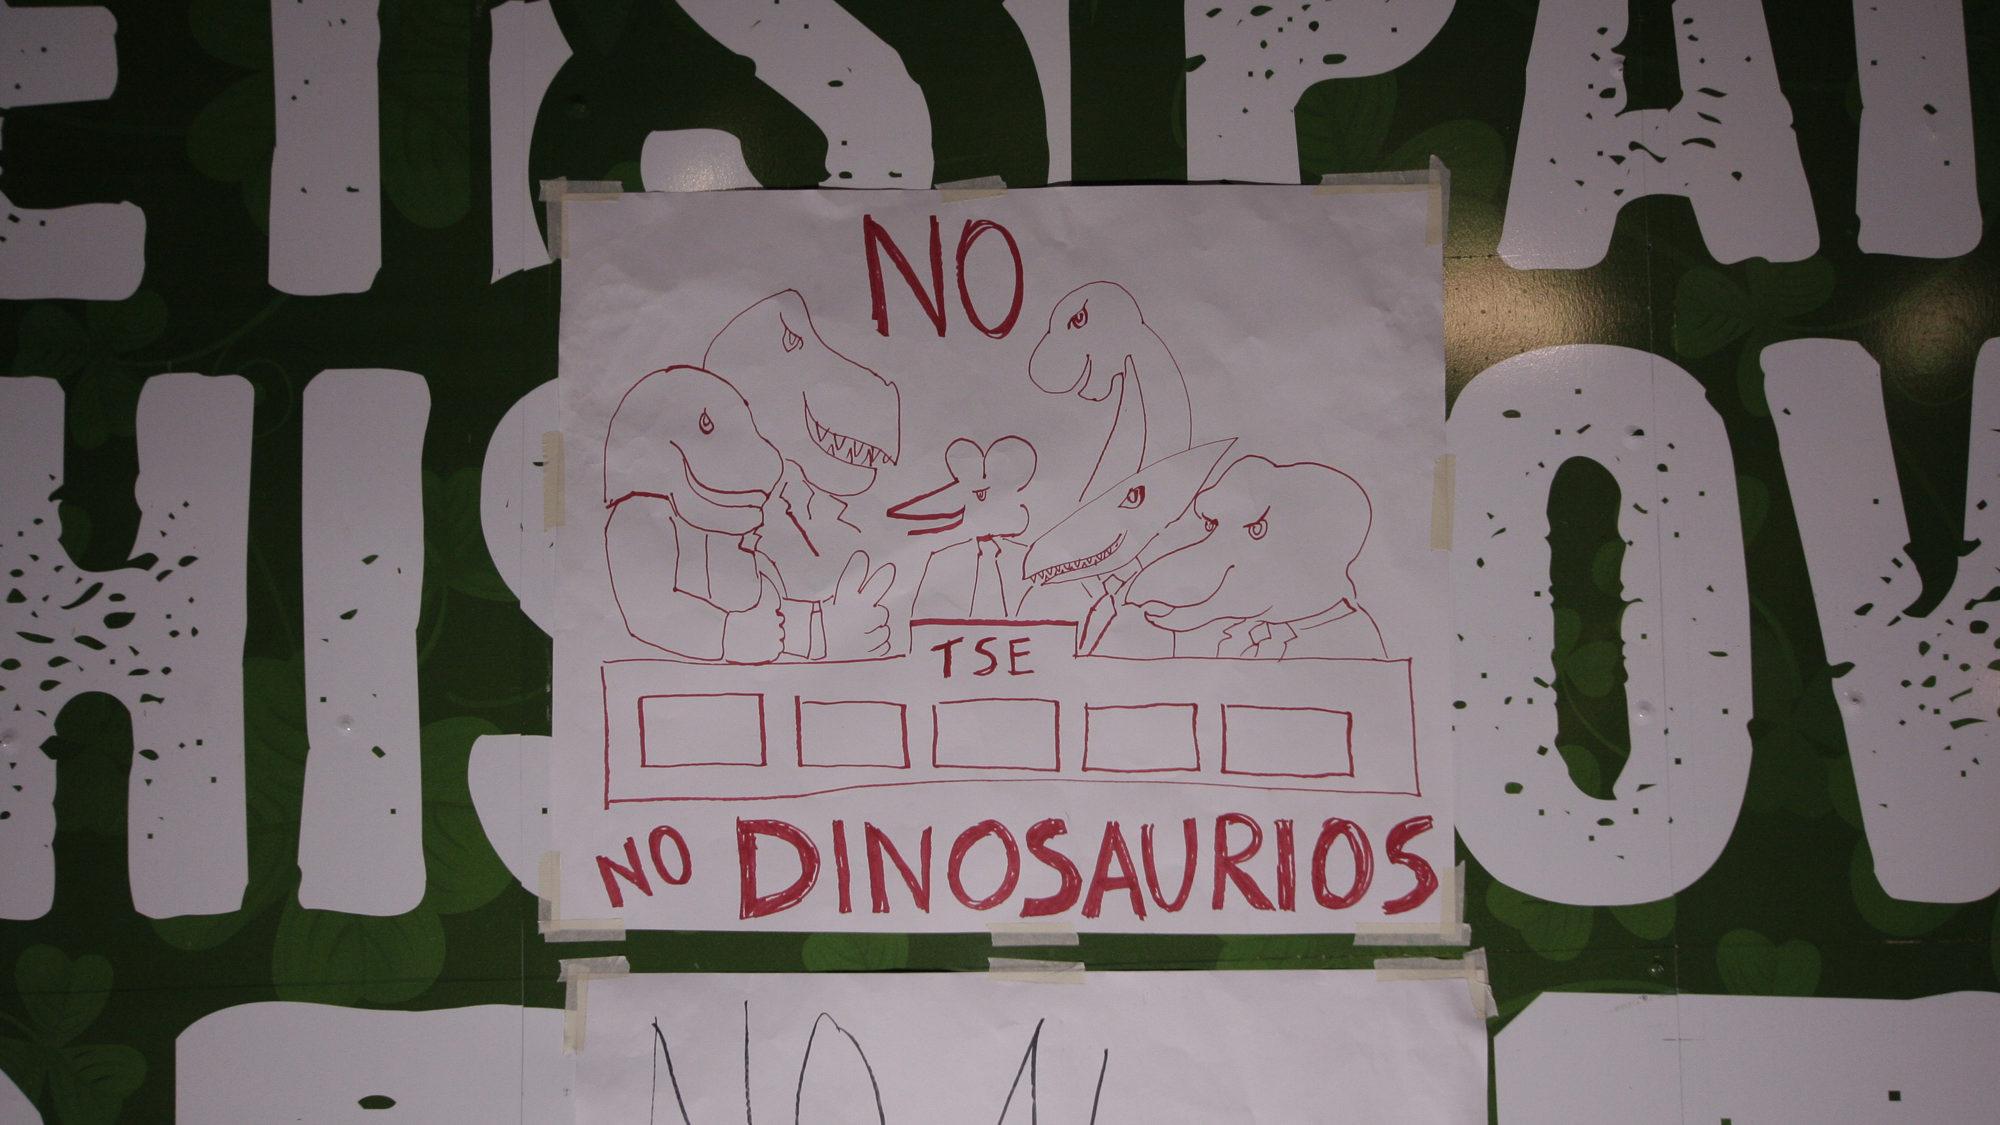 «Queremos demostrar que ya no queremos dinopolíticos»